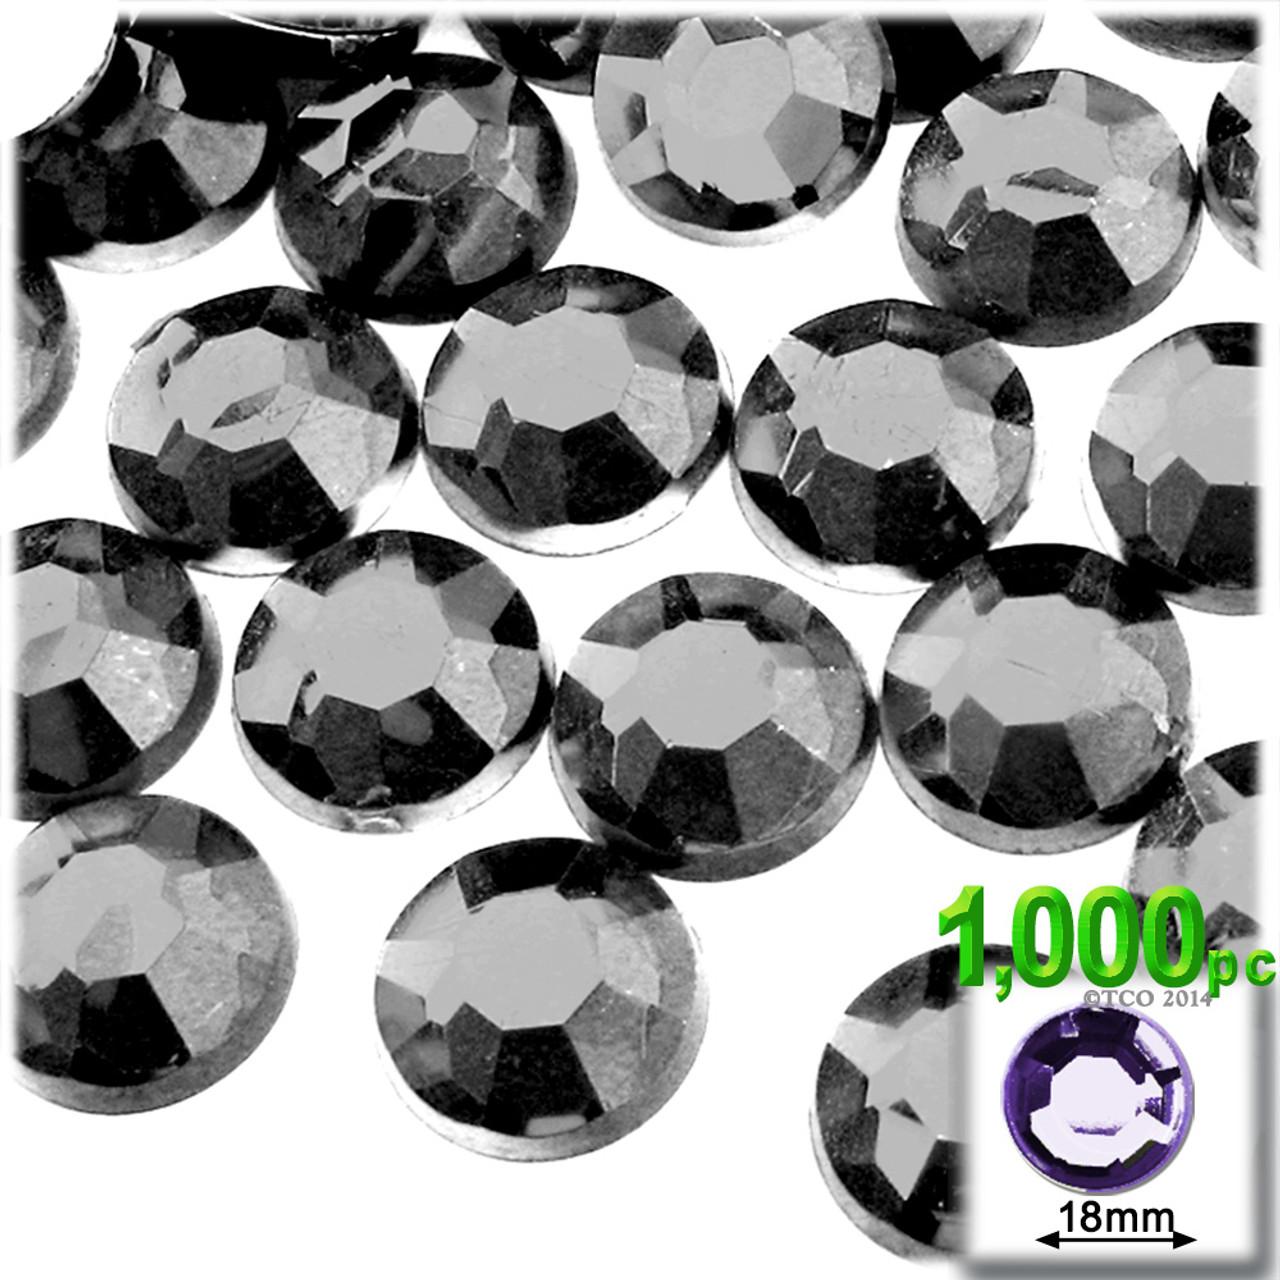 1000 BLACK Rhinestones 2mm Acrylic flatback gems round diamond shape